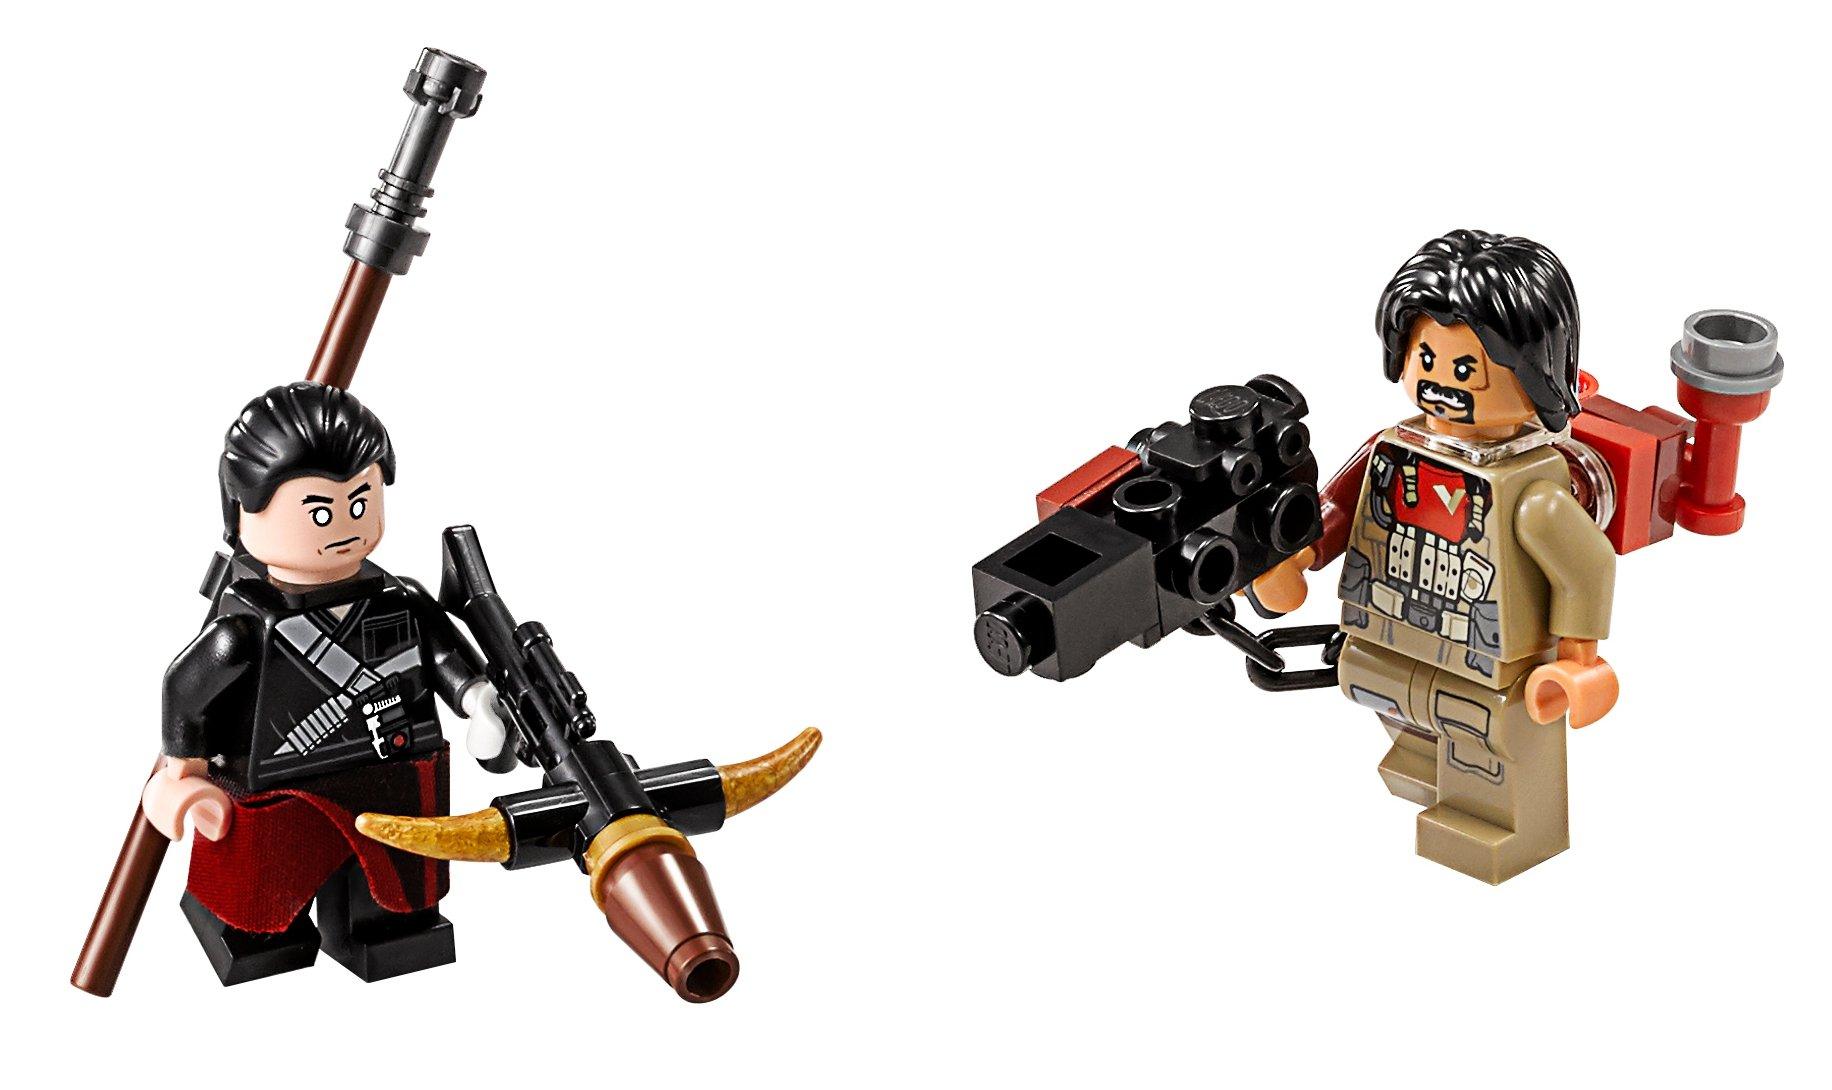 lego star wars sets based on rogue one officially revealed. Black Bedroom Furniture Sets. Home Design Ideas